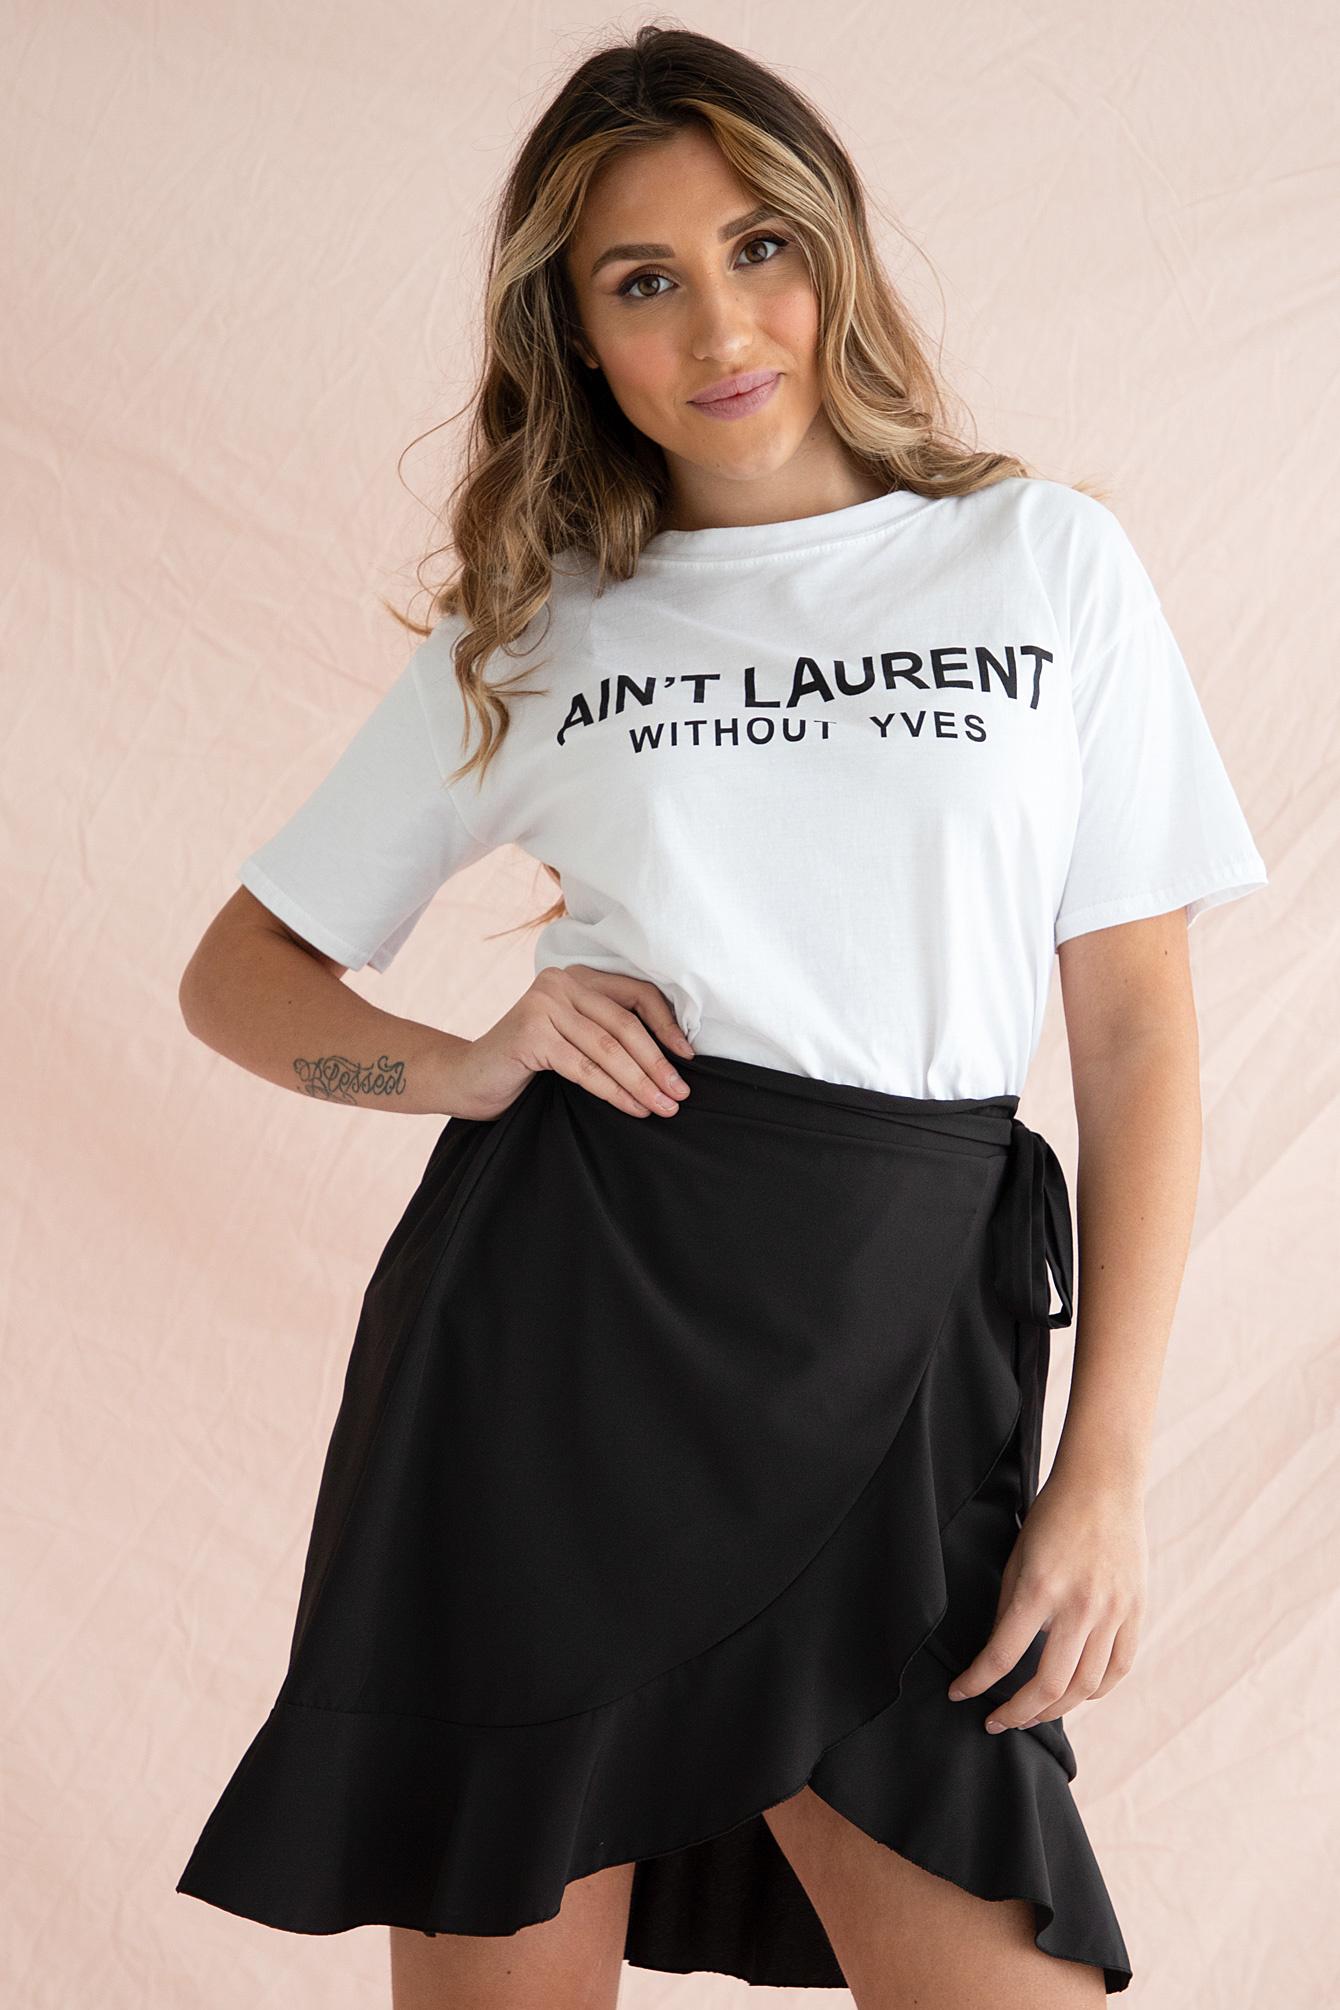 Ain't laurent white